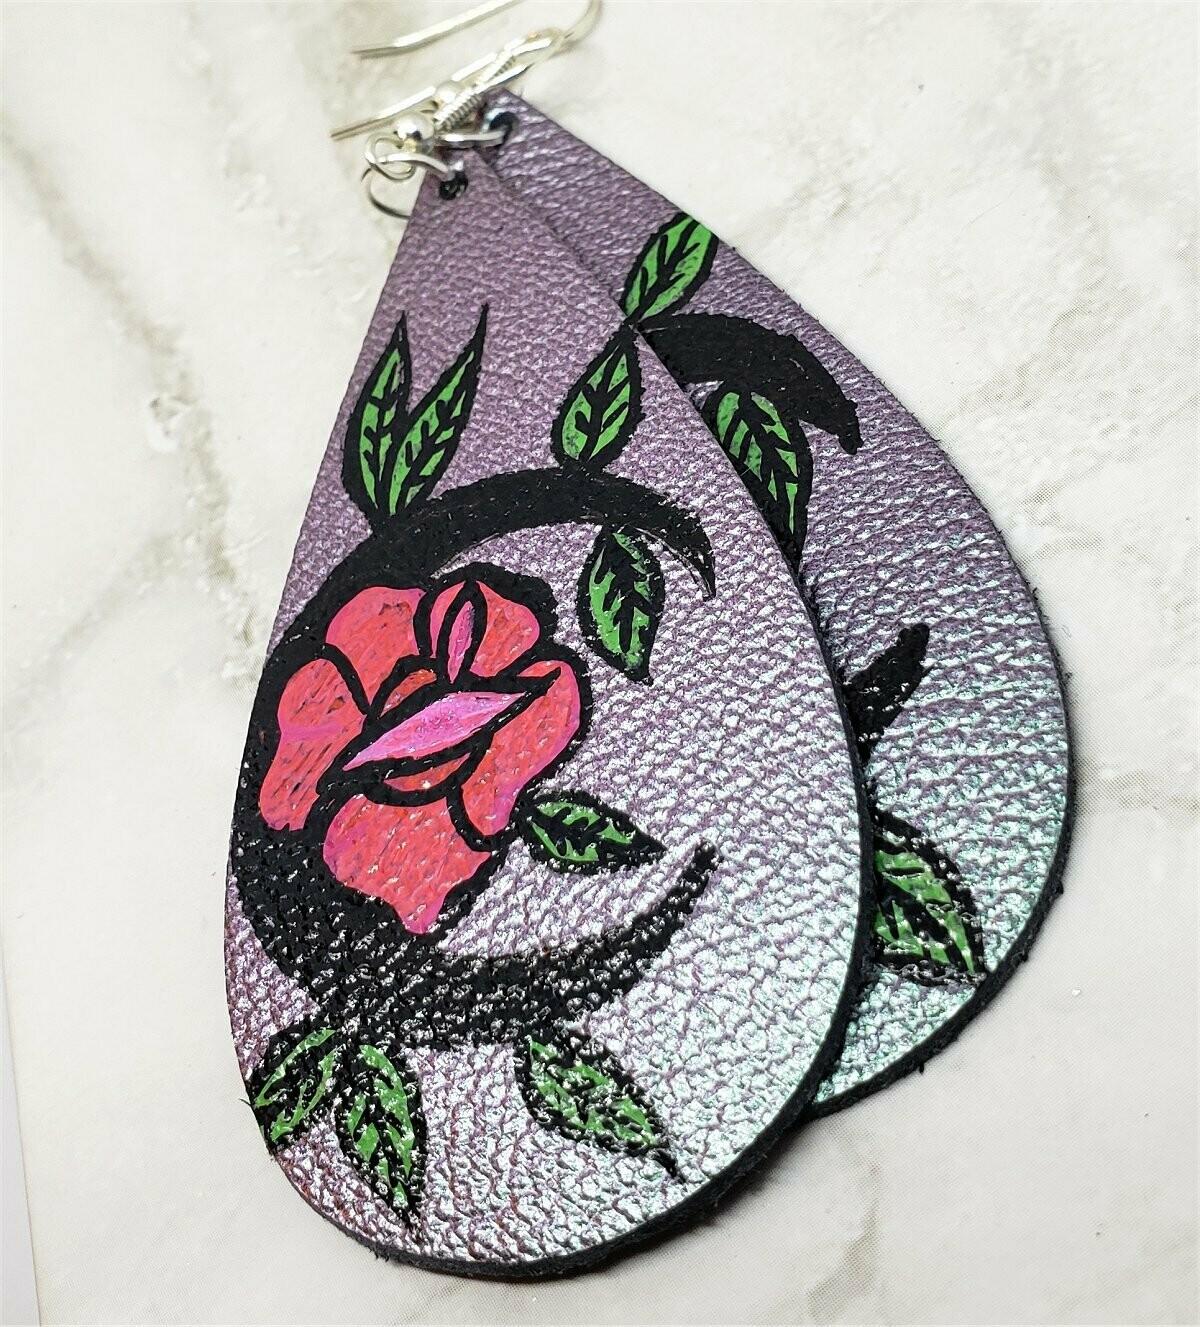 Metallic Color Shifting Teardrop Earrings with a Hand Painted Flower Moon OOAK